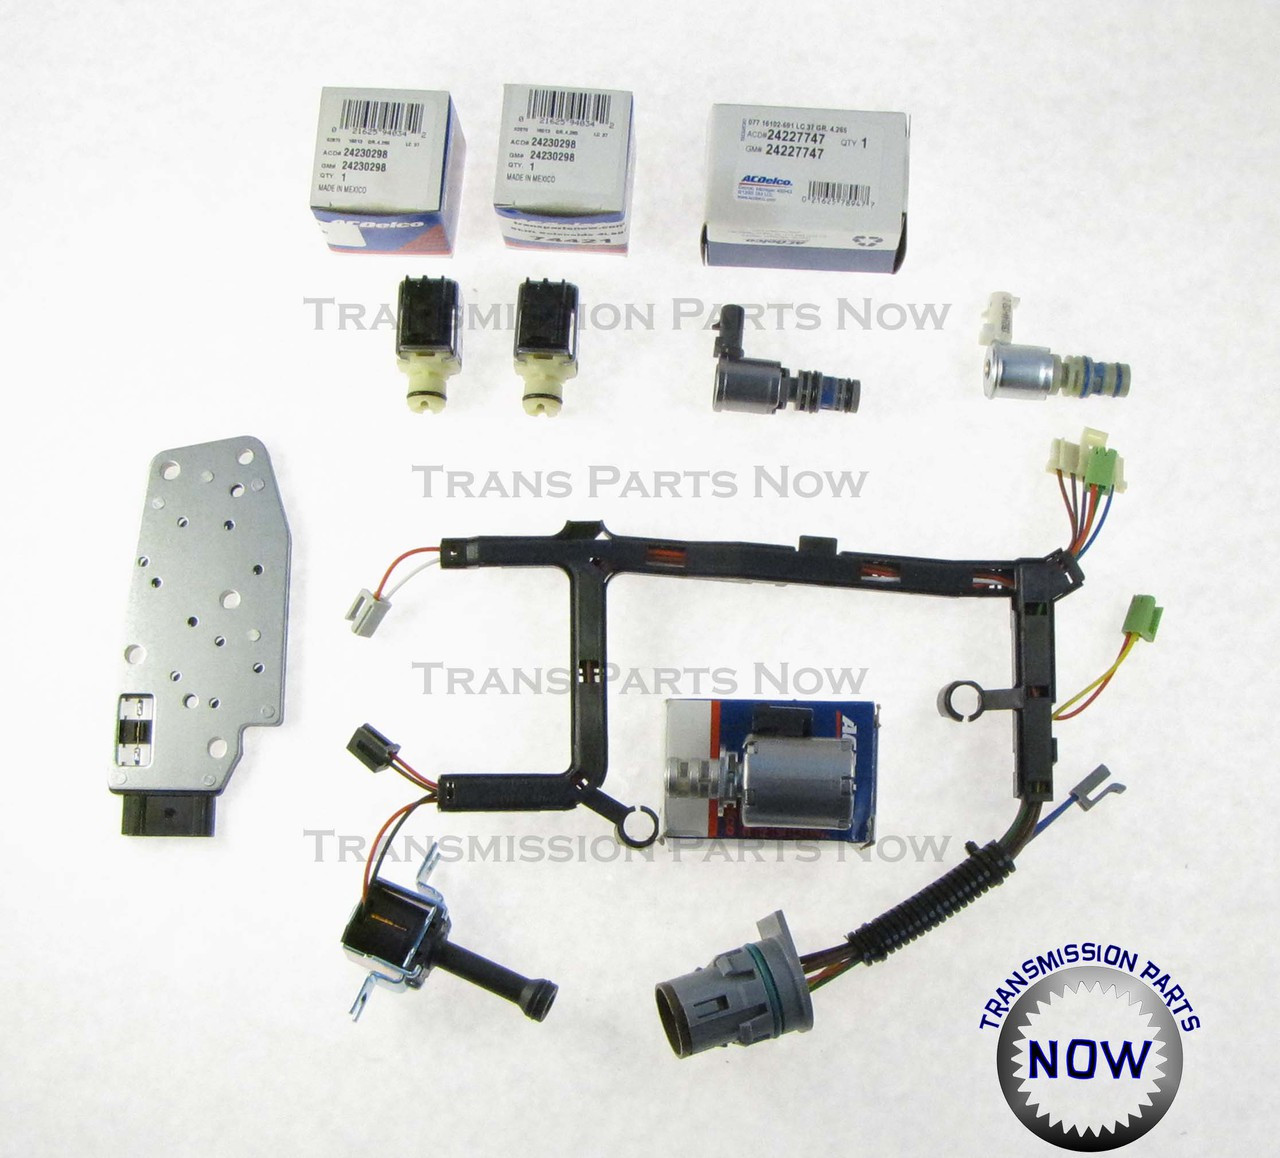 Transmission Solenoid 7Pcs 4L60E 4L65E Shift Solenoid Wire Harness Kit for GM Chevrolet Buick Pontiac Hummer Oldsmobile